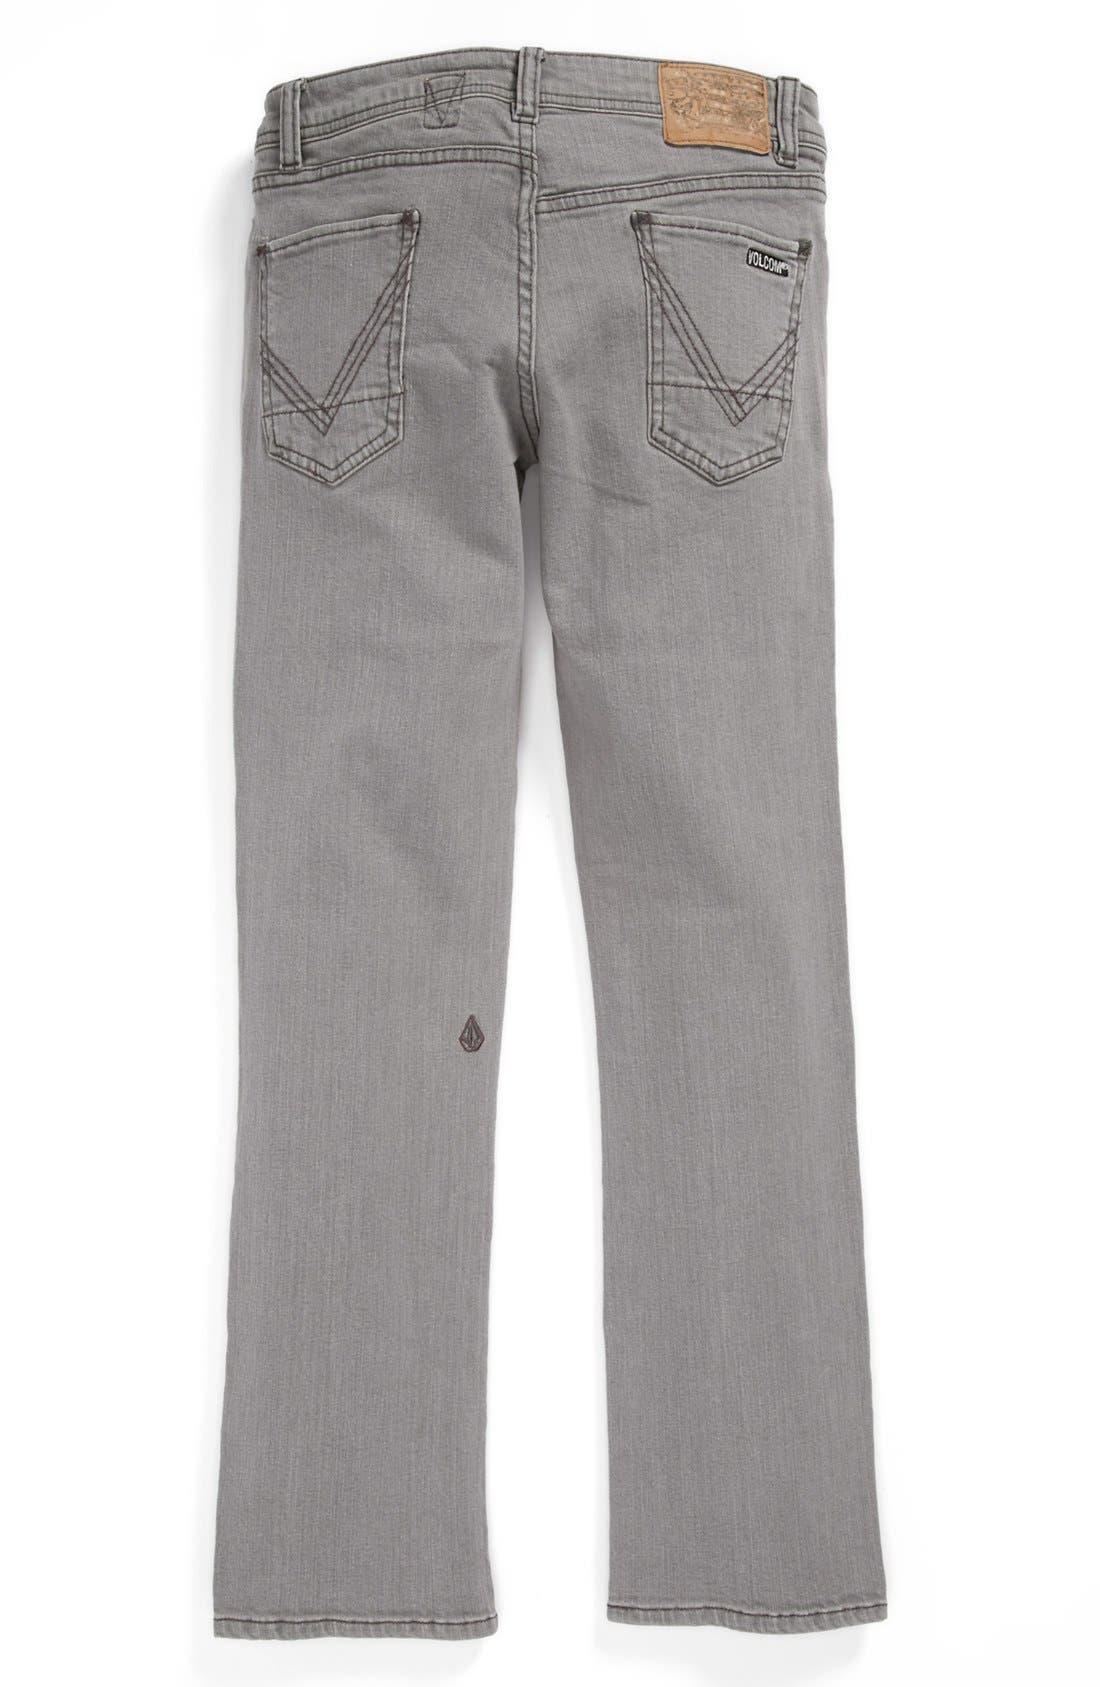 Main Image - Volcom 'Vorta' Jeans (Big Boys)